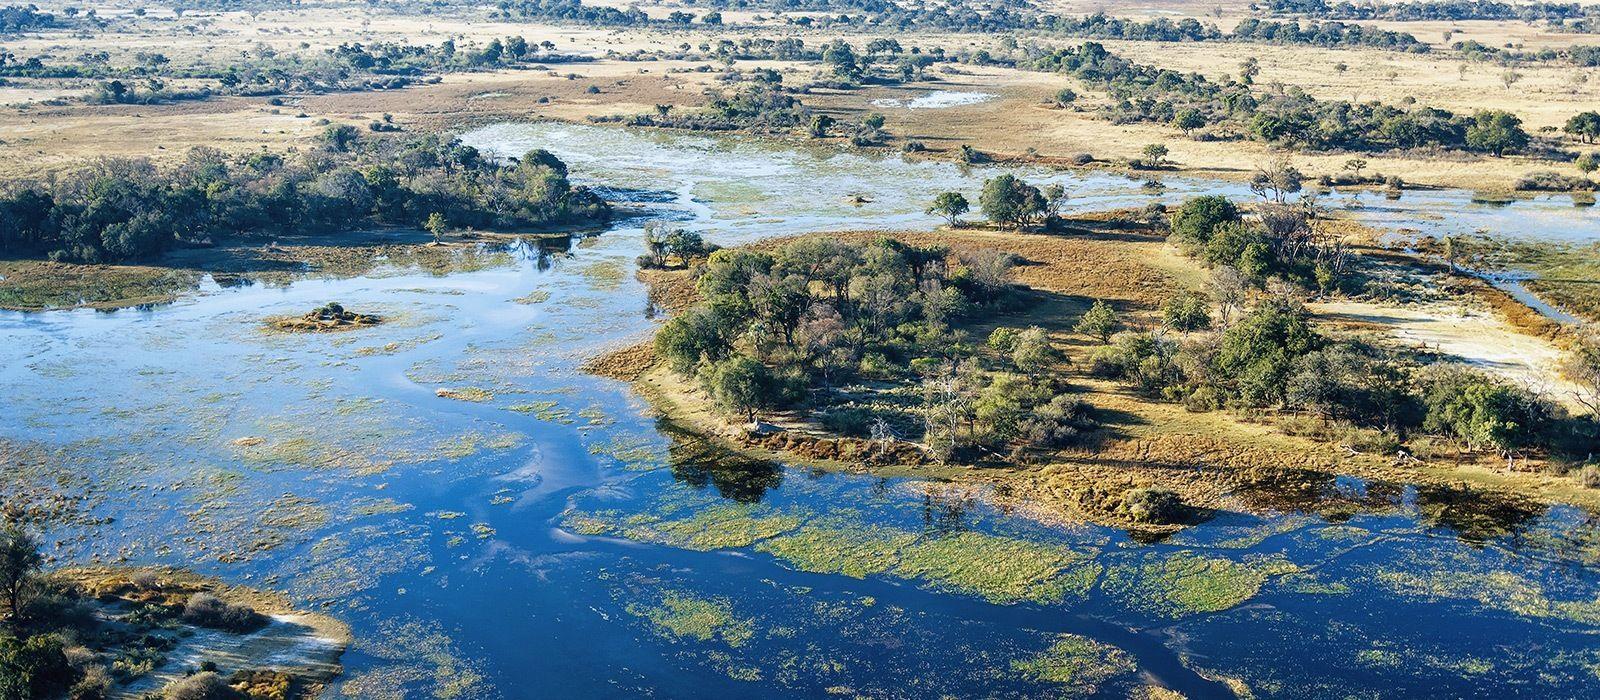 Victoria Falls & Botswana Highlights Tour Trip 3